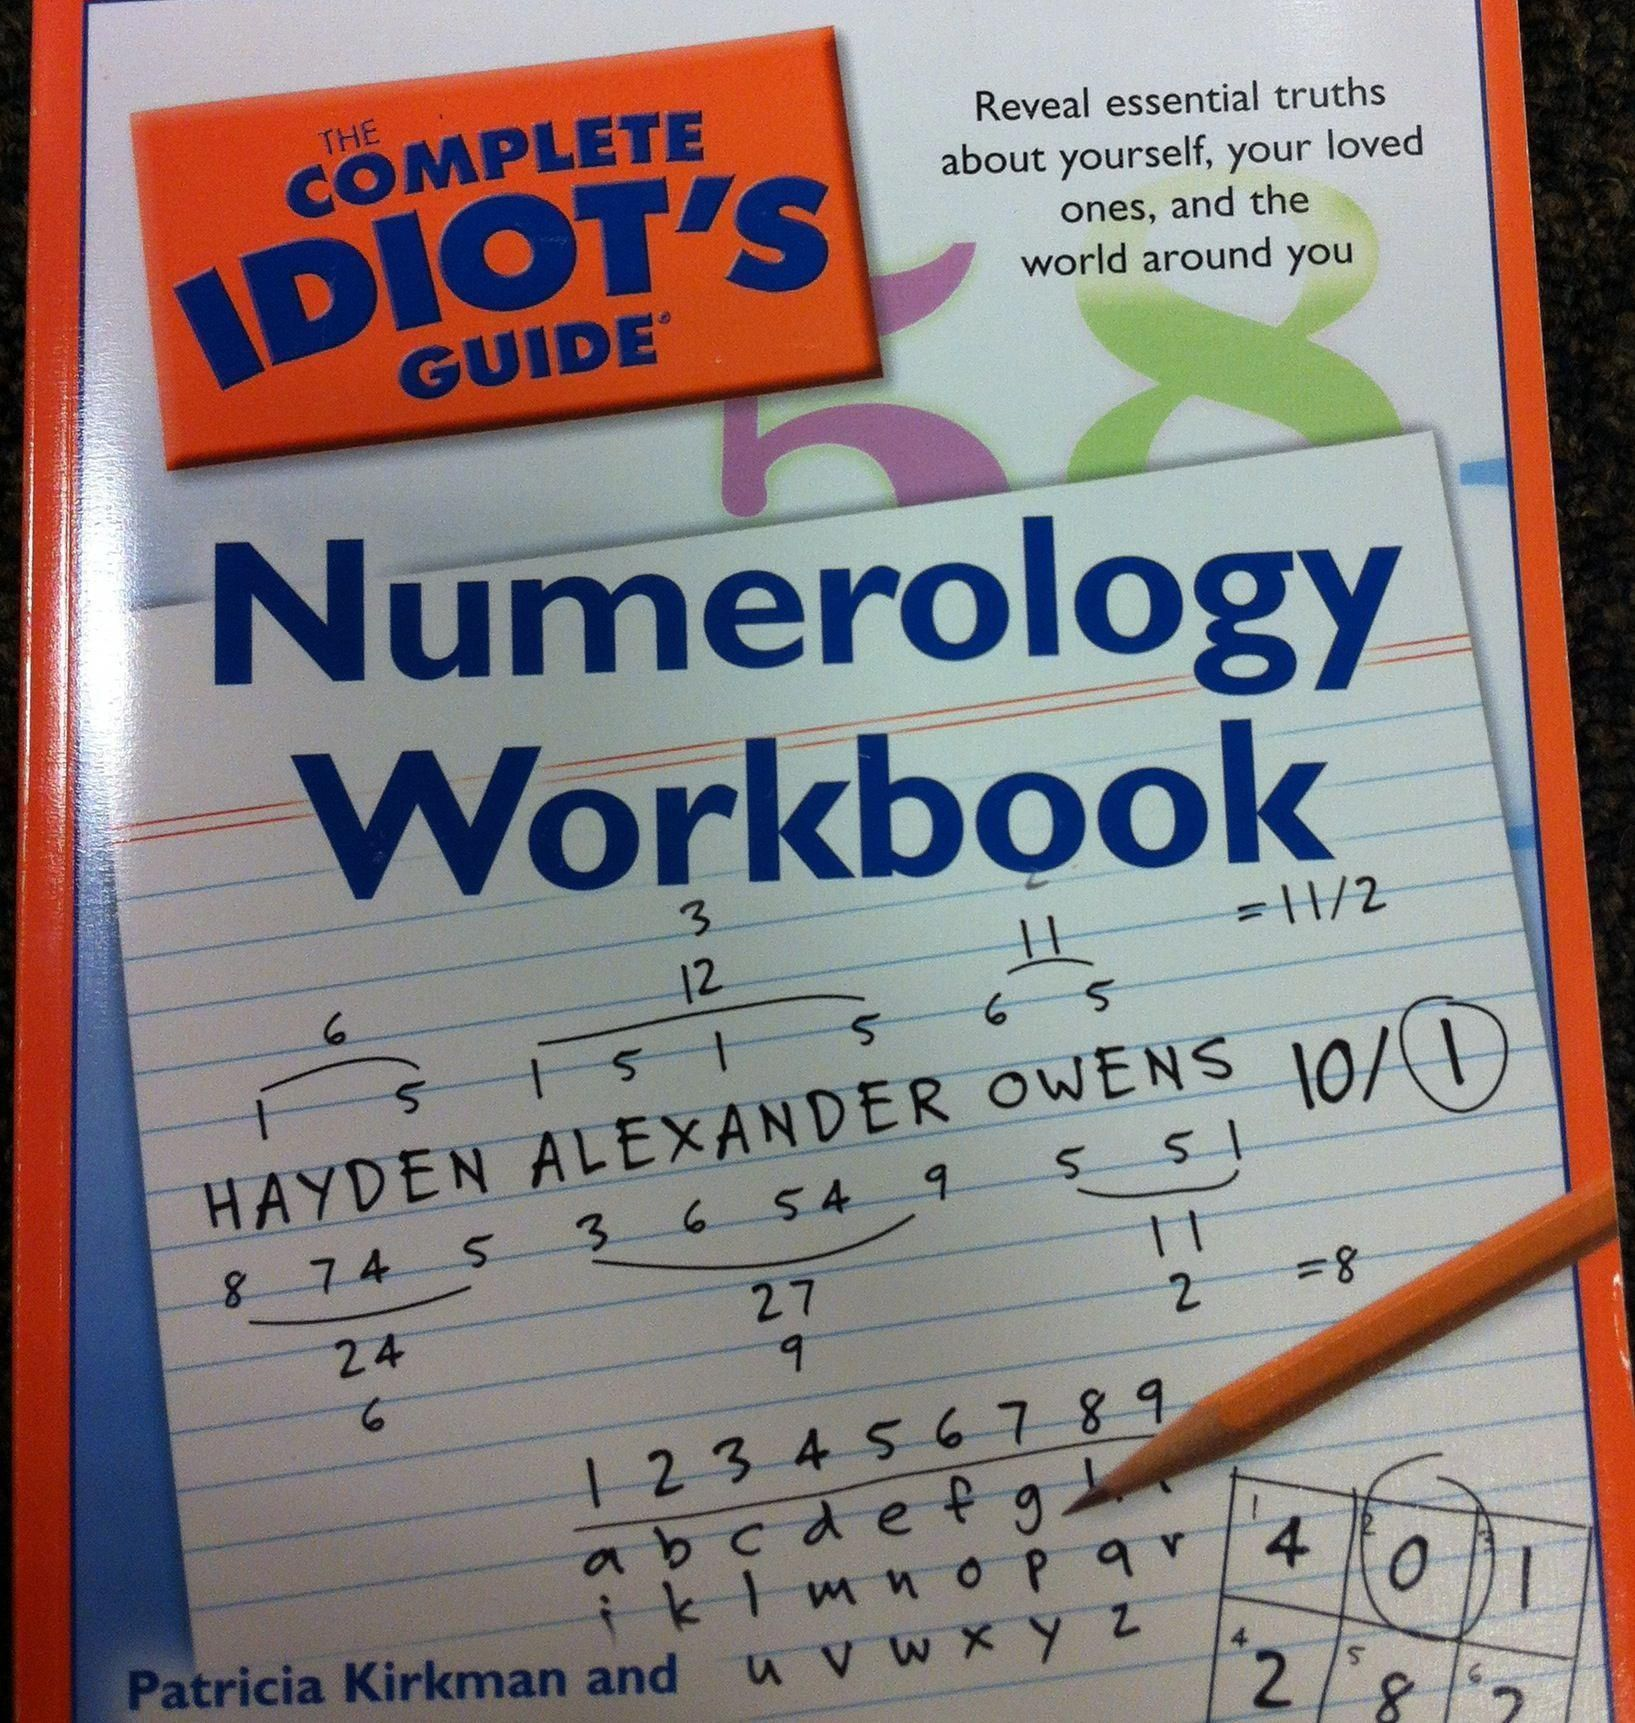 Numerology I Might Need This Numerology I Might